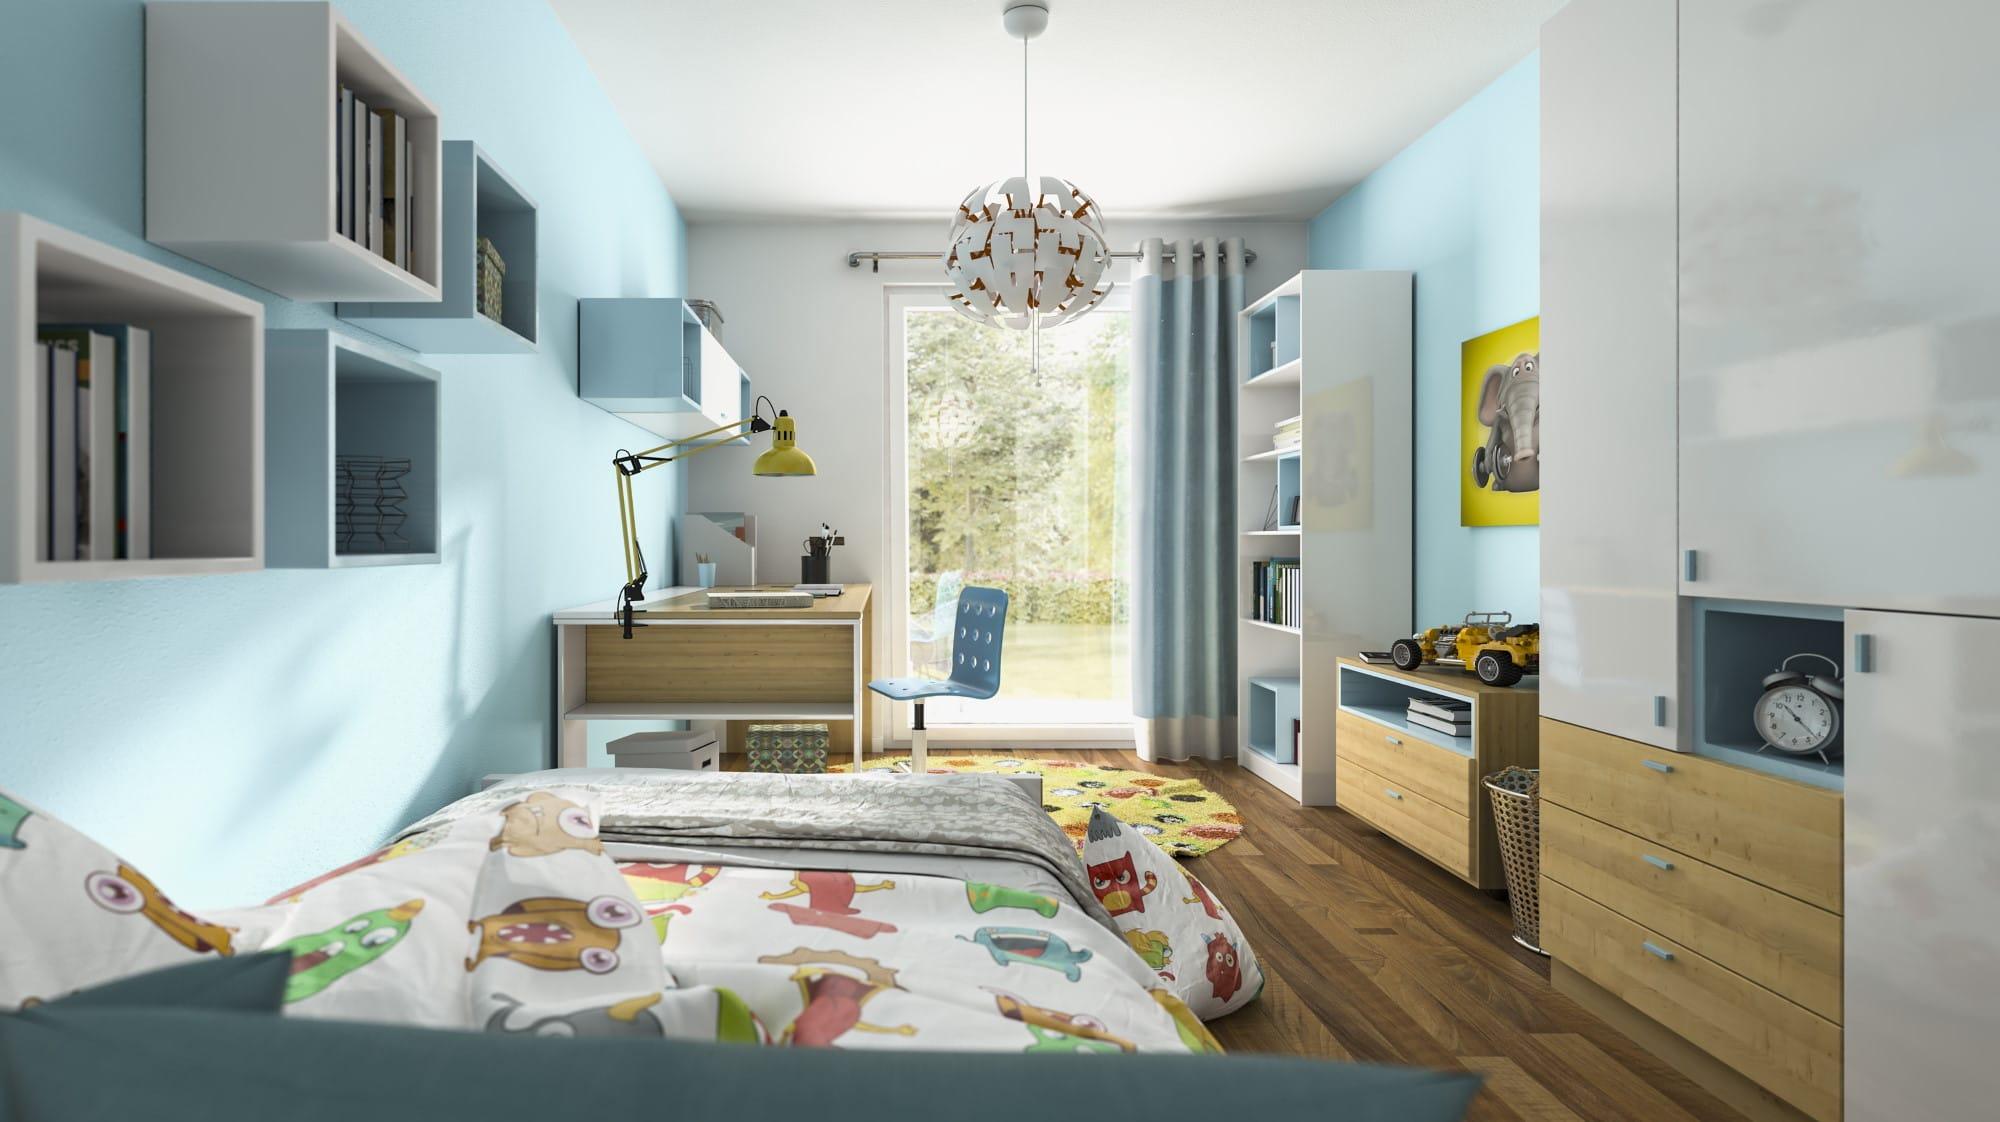 Kinderzimmer modern Wandgestaltung Farbe blau weiß Holz - Haus Design Ideen innen Town Country Haus Bungalow 131 - HausbauDirekt.de